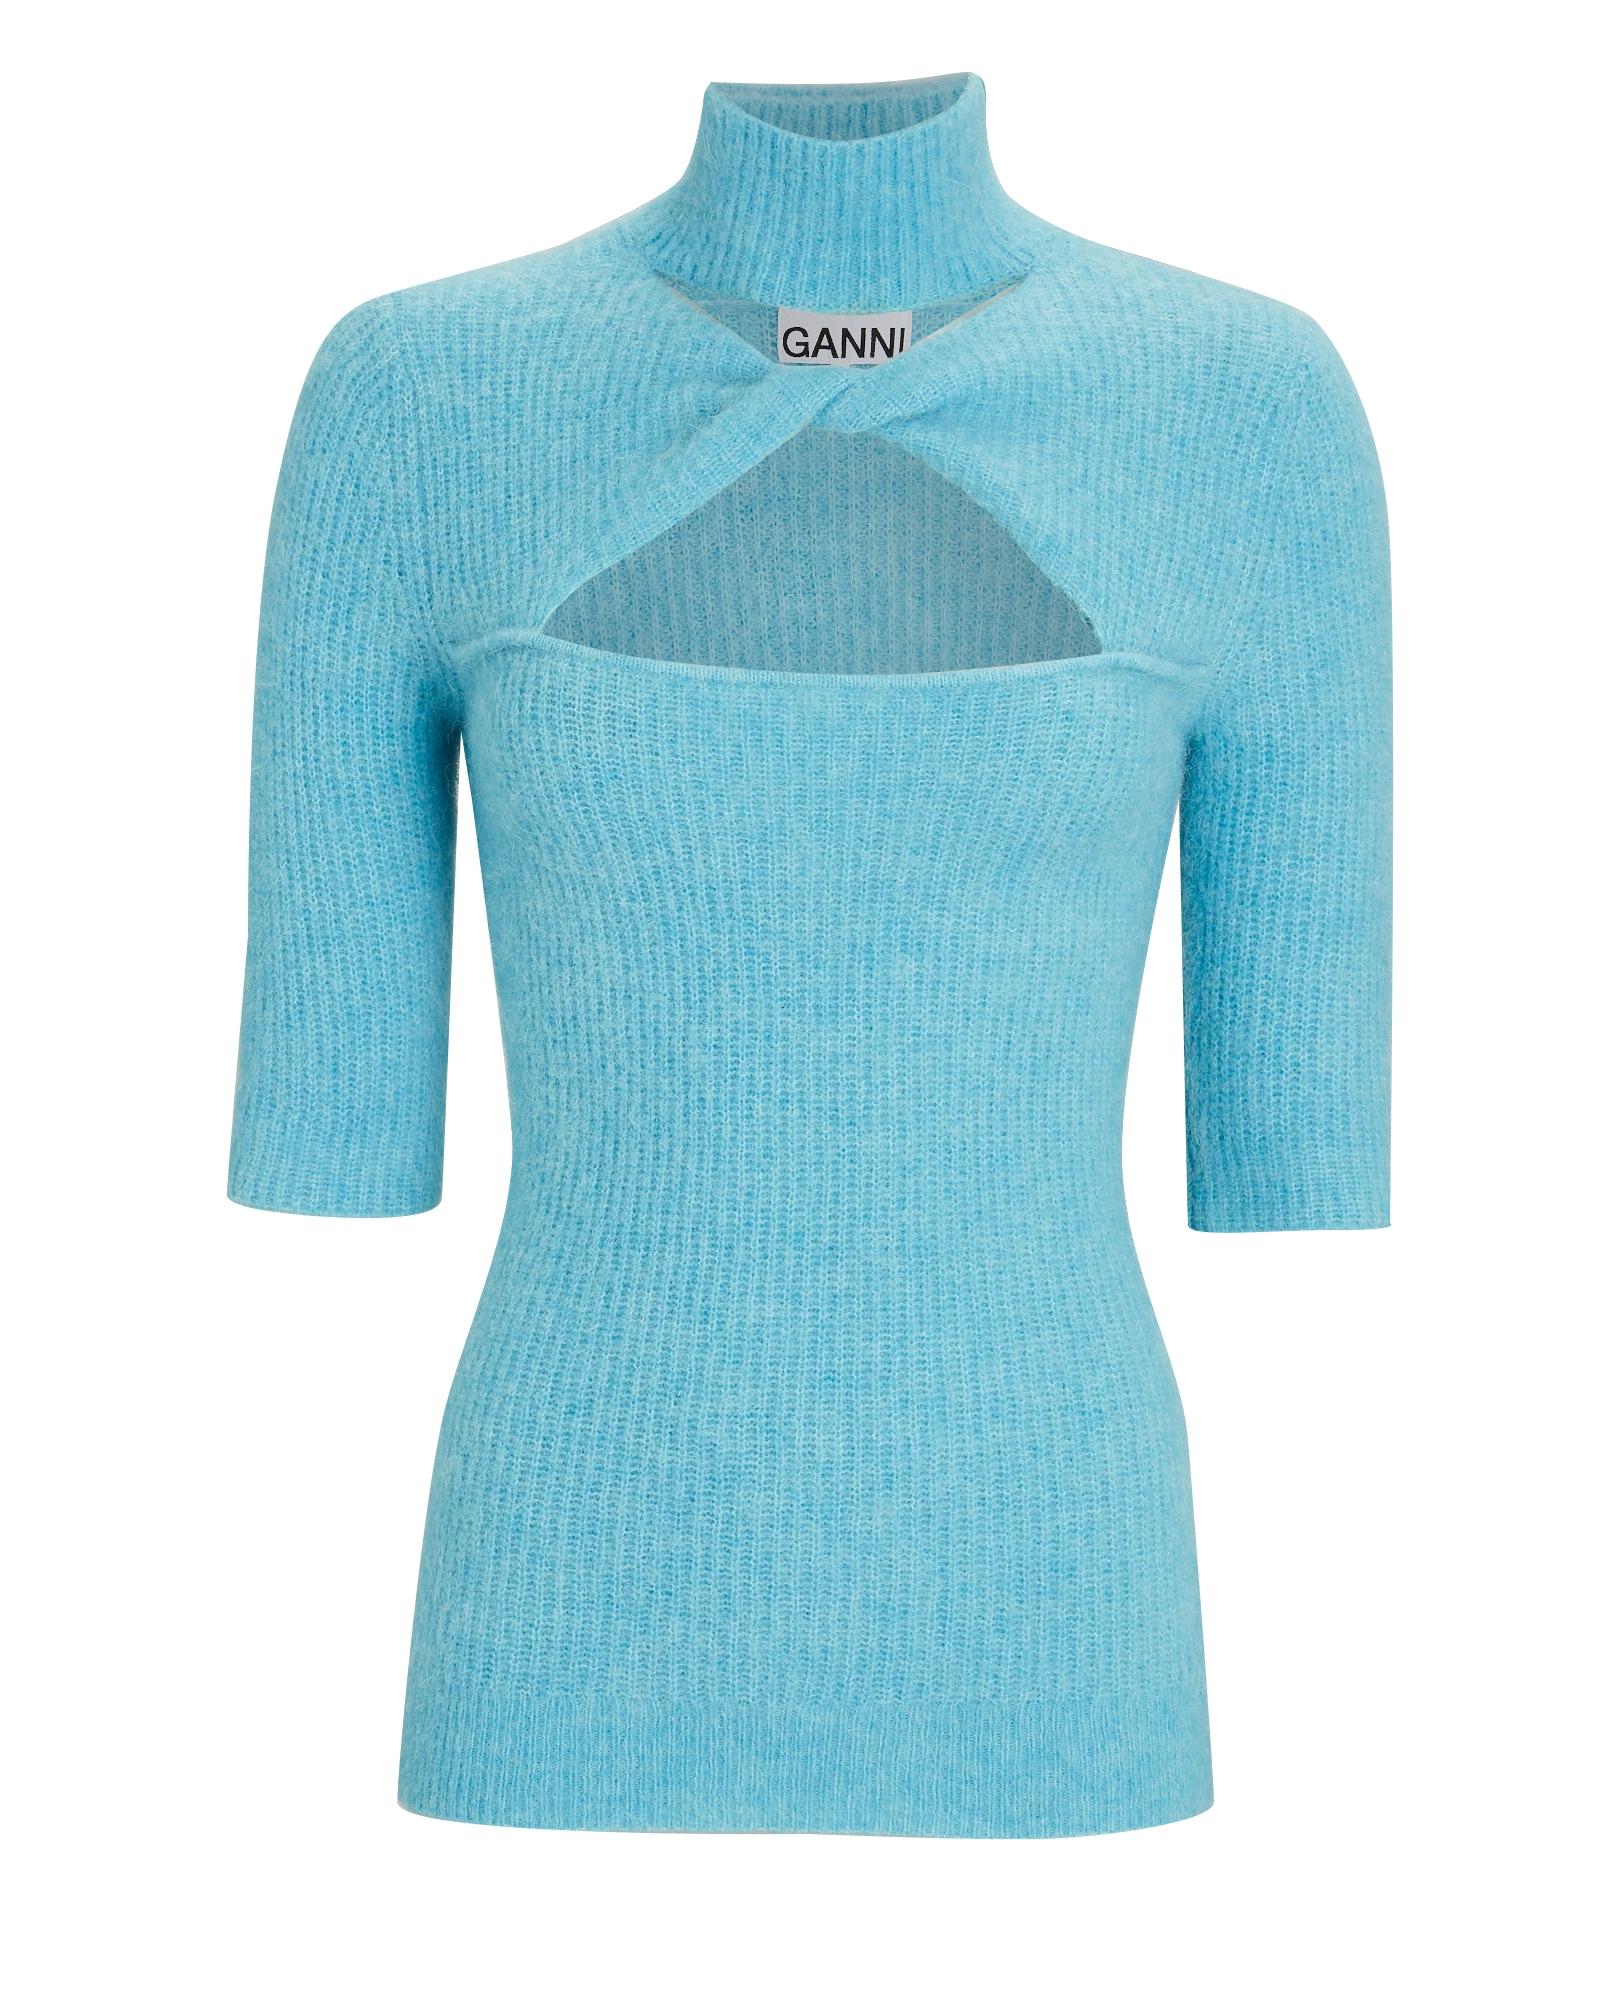 Ganni Wools Twist Front Turtleneck Sweater